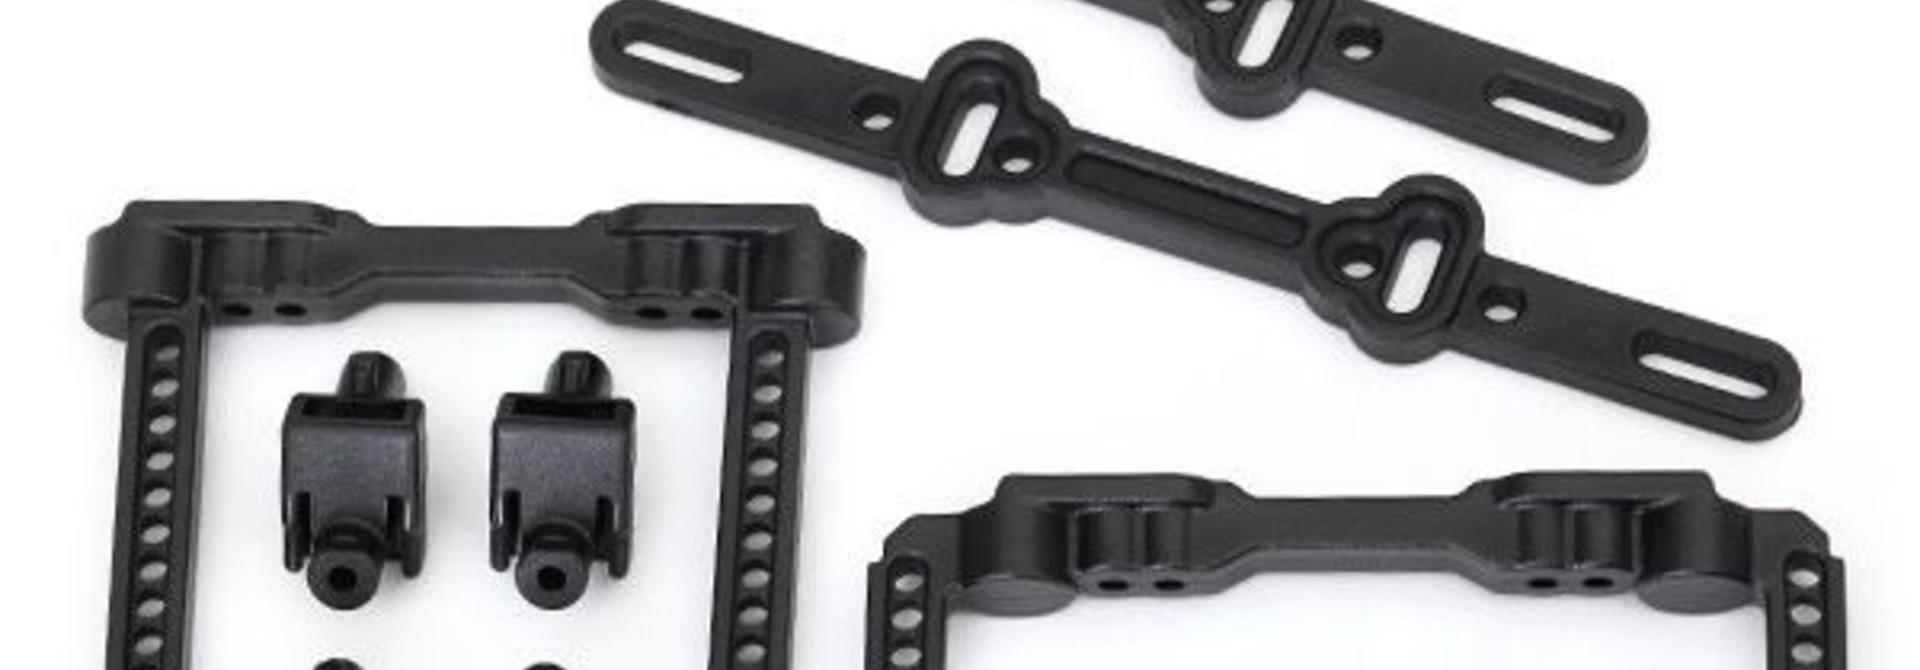 Body mounts, front & rear/ body mount posts/ body mount slid, TRX8316